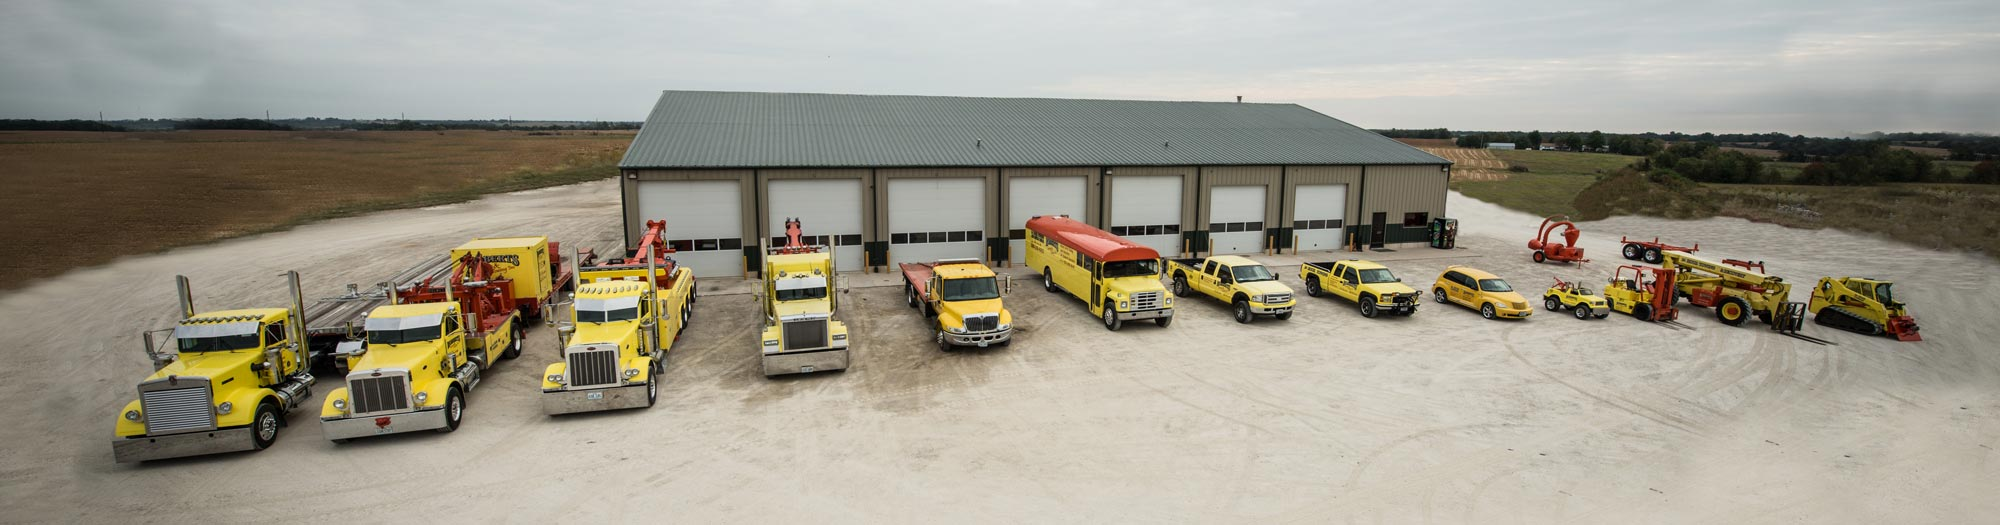 Durham mo Roberts garage and towing, vehicle repair service